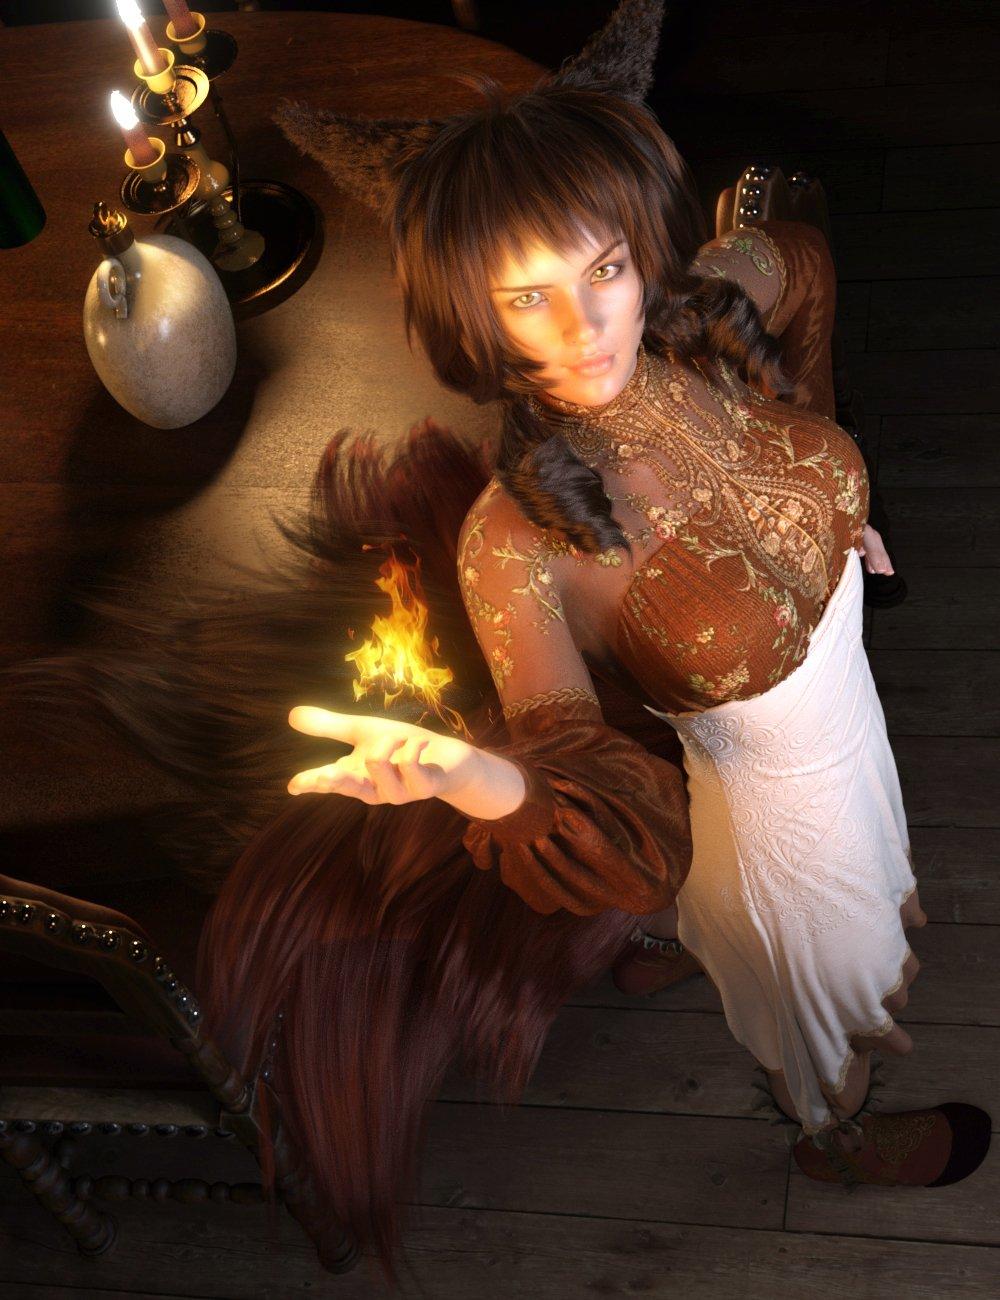 FE Fantasy Hair Vol 1 for Genesis 8 Females by: FeSoul, 3D Models by Daz 3D